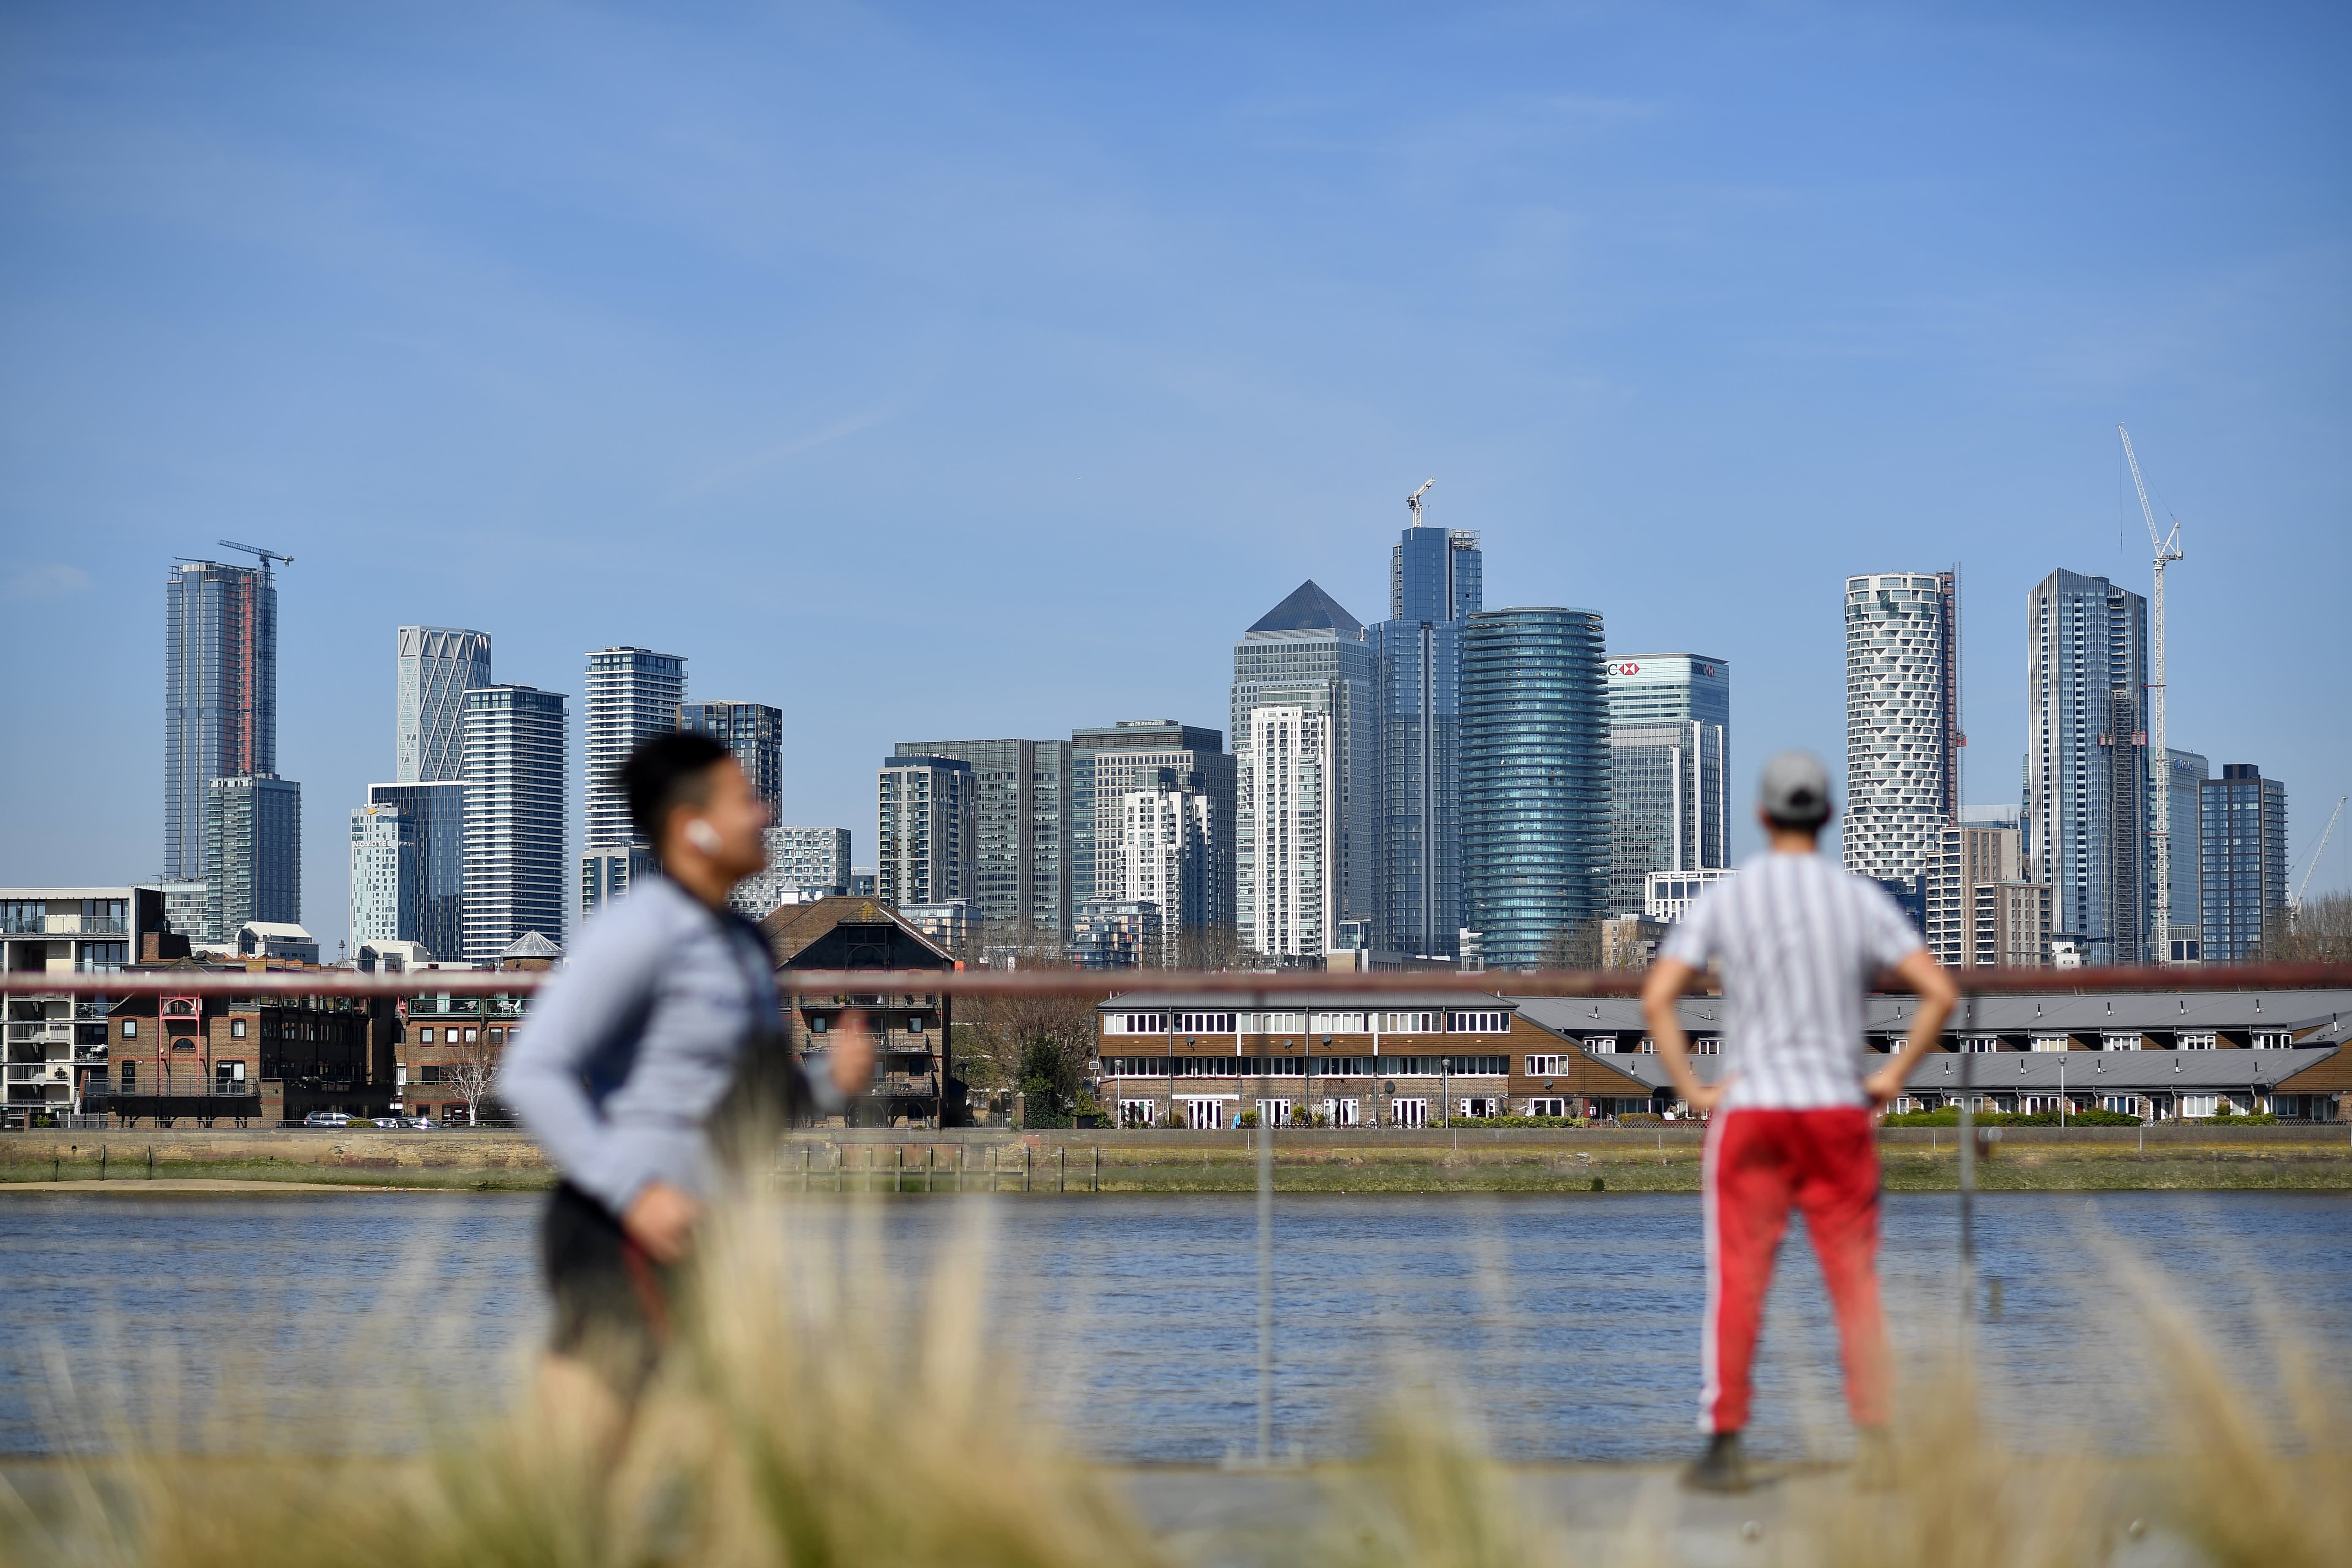 Fintech firms race to plug gaps in UK's coronavirus relief measures